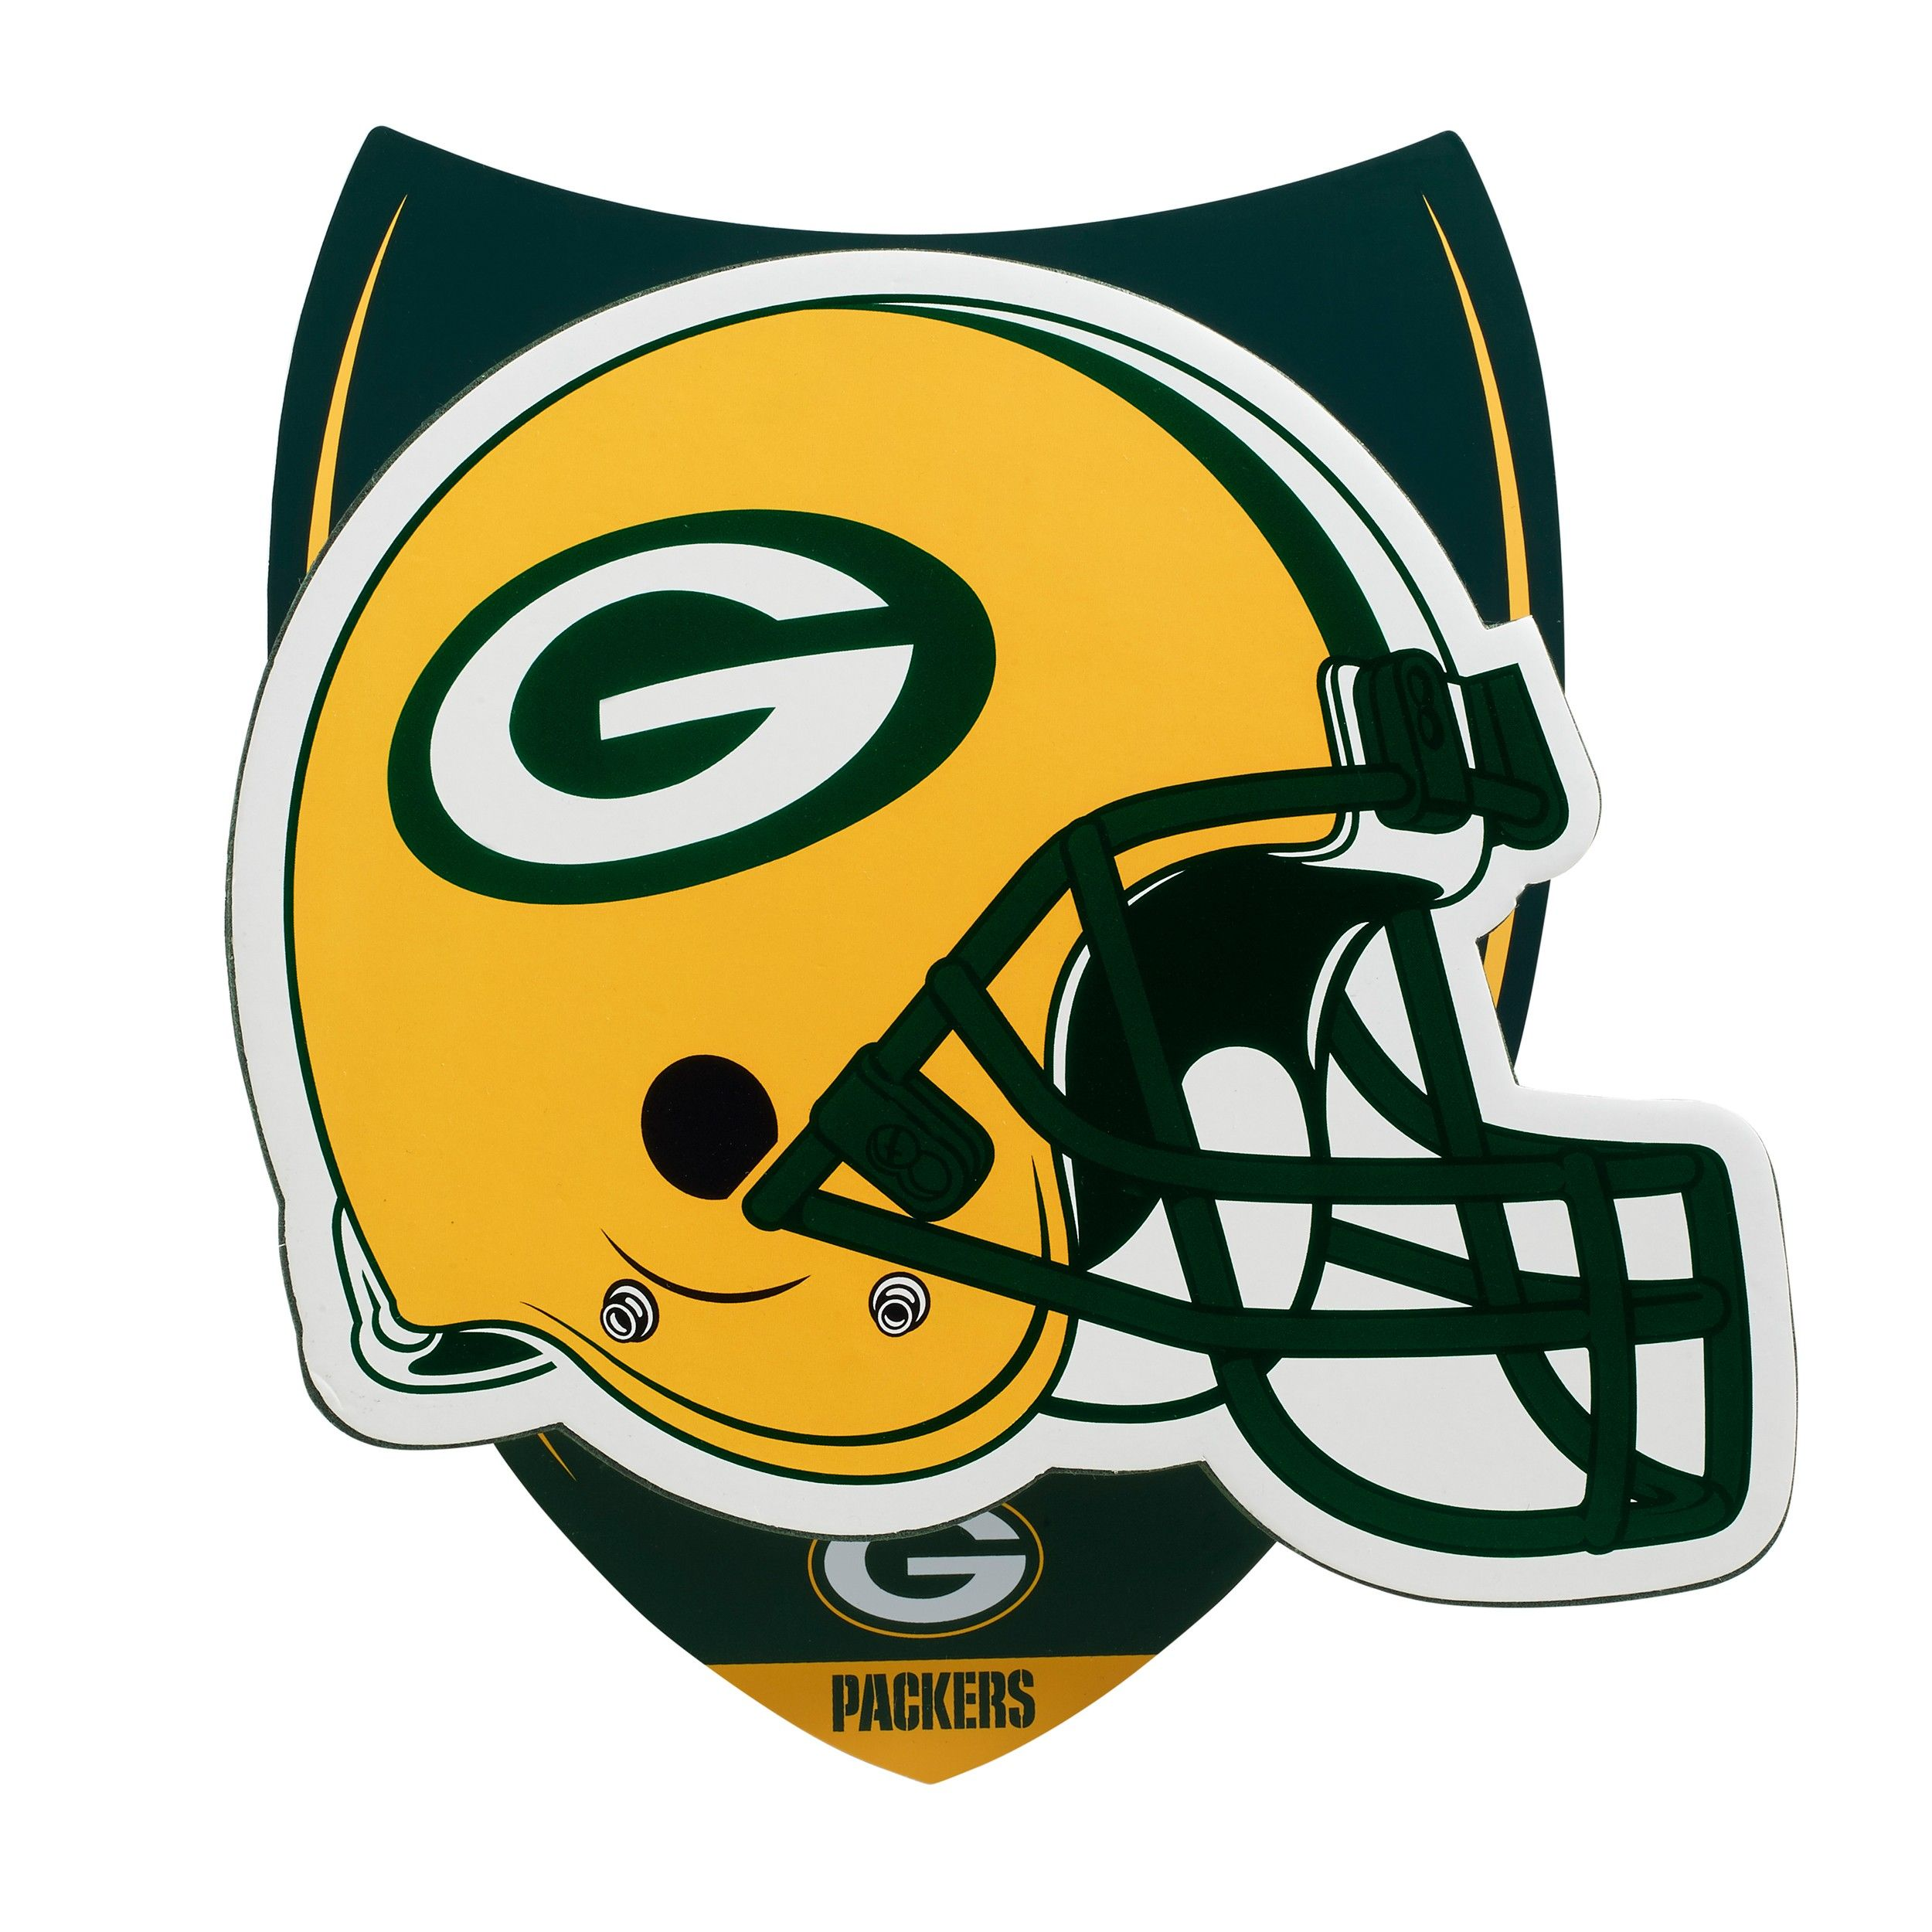 Image Result For Green Bay Packers Helmet 1960s Green Bay Packers Helmet Green Bay Packers Helmet